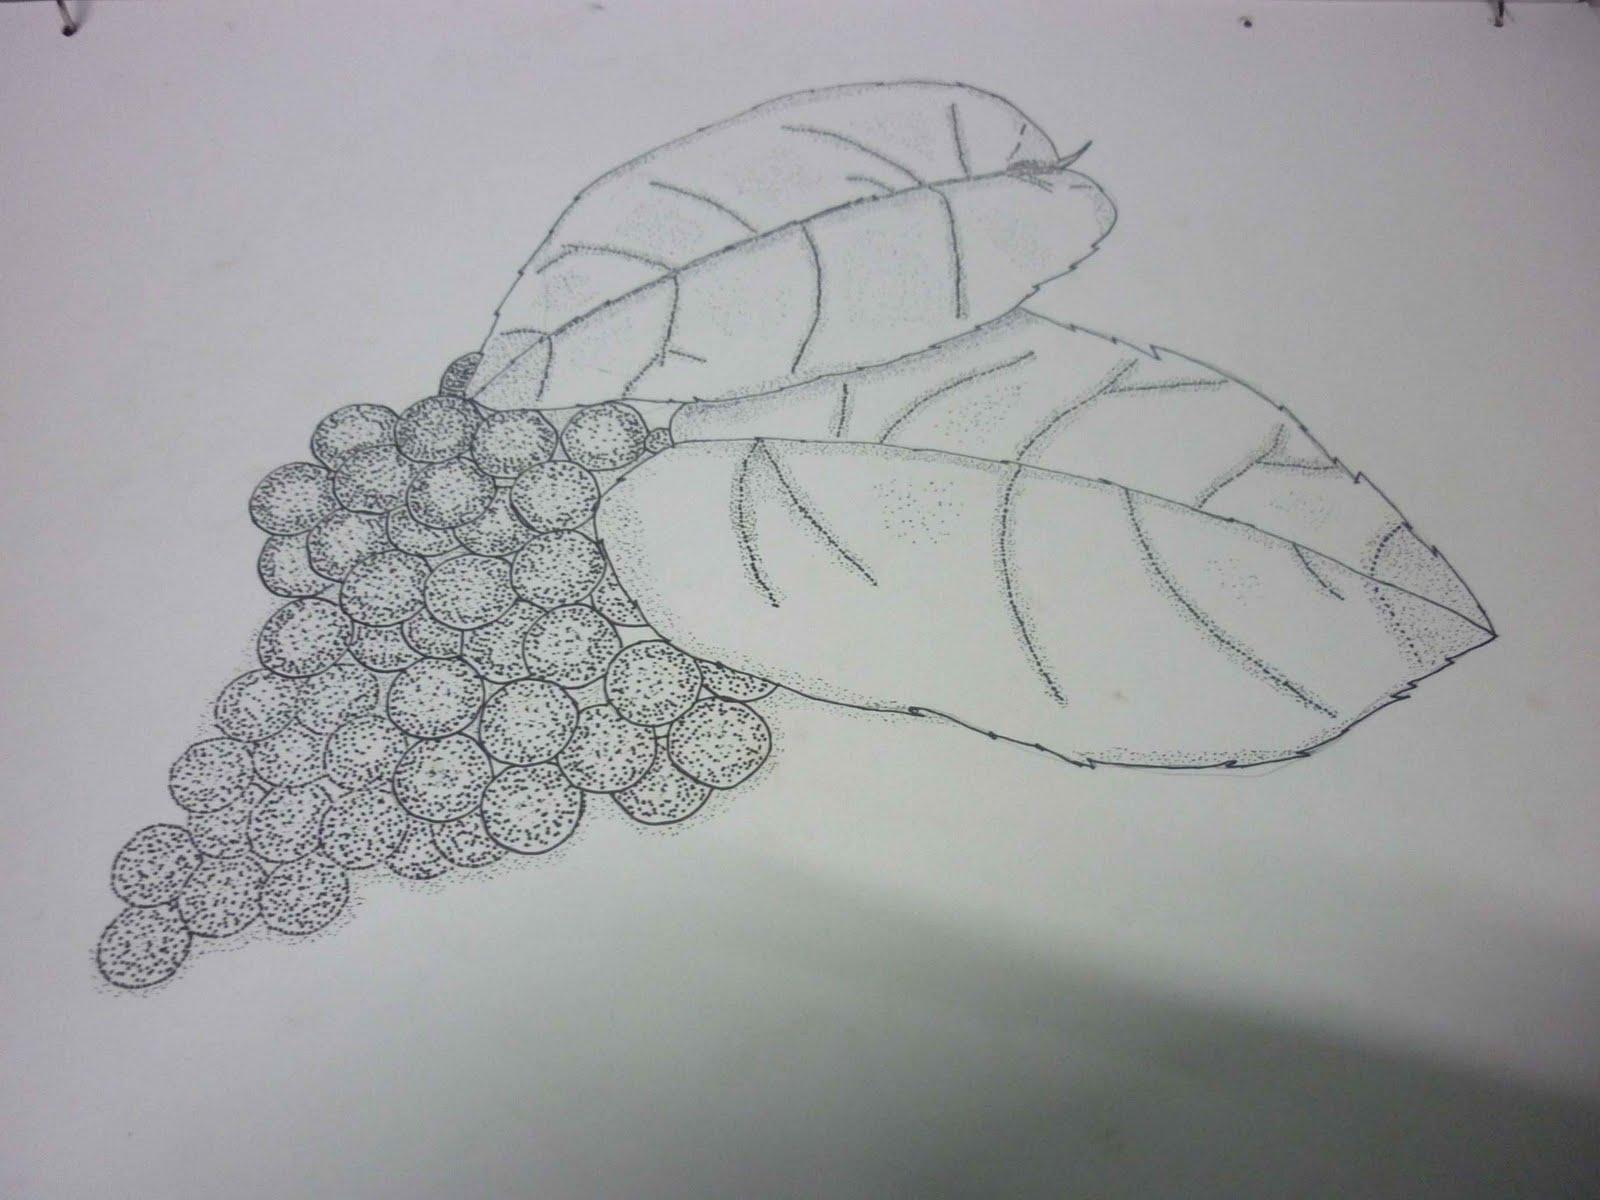 Muhamad Zulhilmi S Portfolio Drawing Stu S Mix Media Hatching Cross Hatching Stippling And